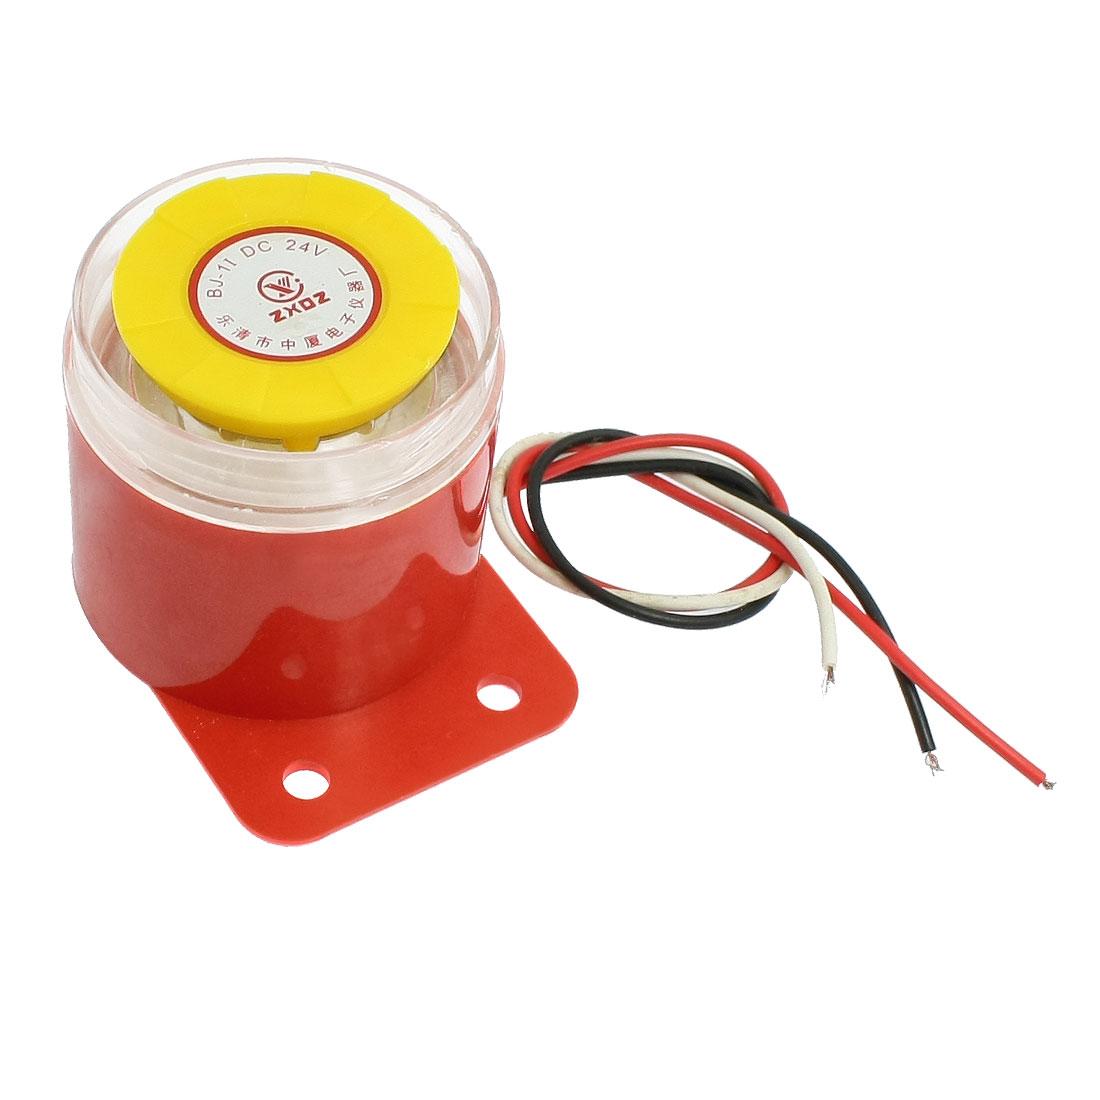 AC220V Plastic Housing Multifunction Alarm Buzzer Ringer Annunciator